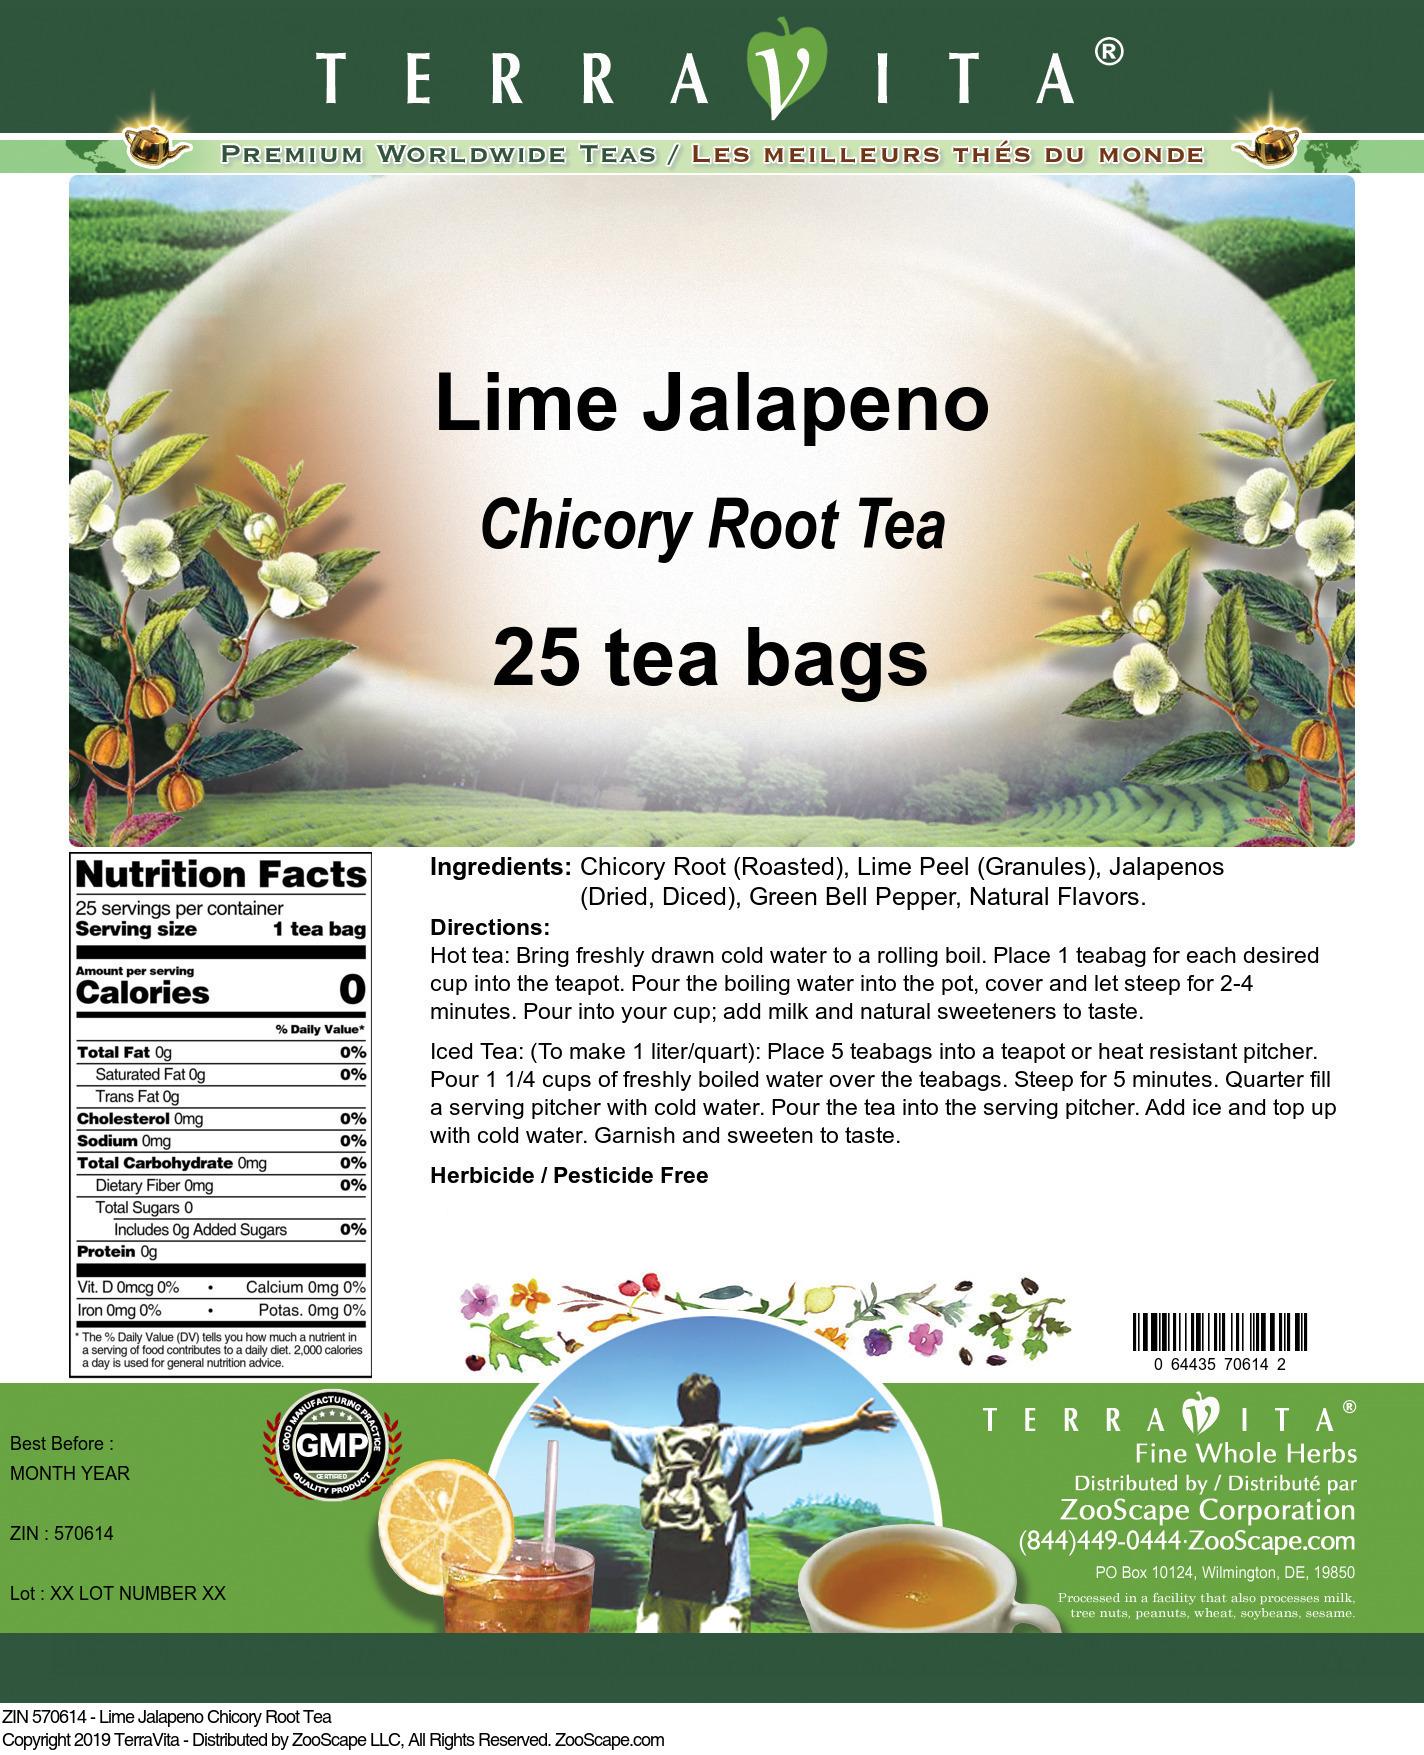 Lime Jalapeno Chicory Root Tea